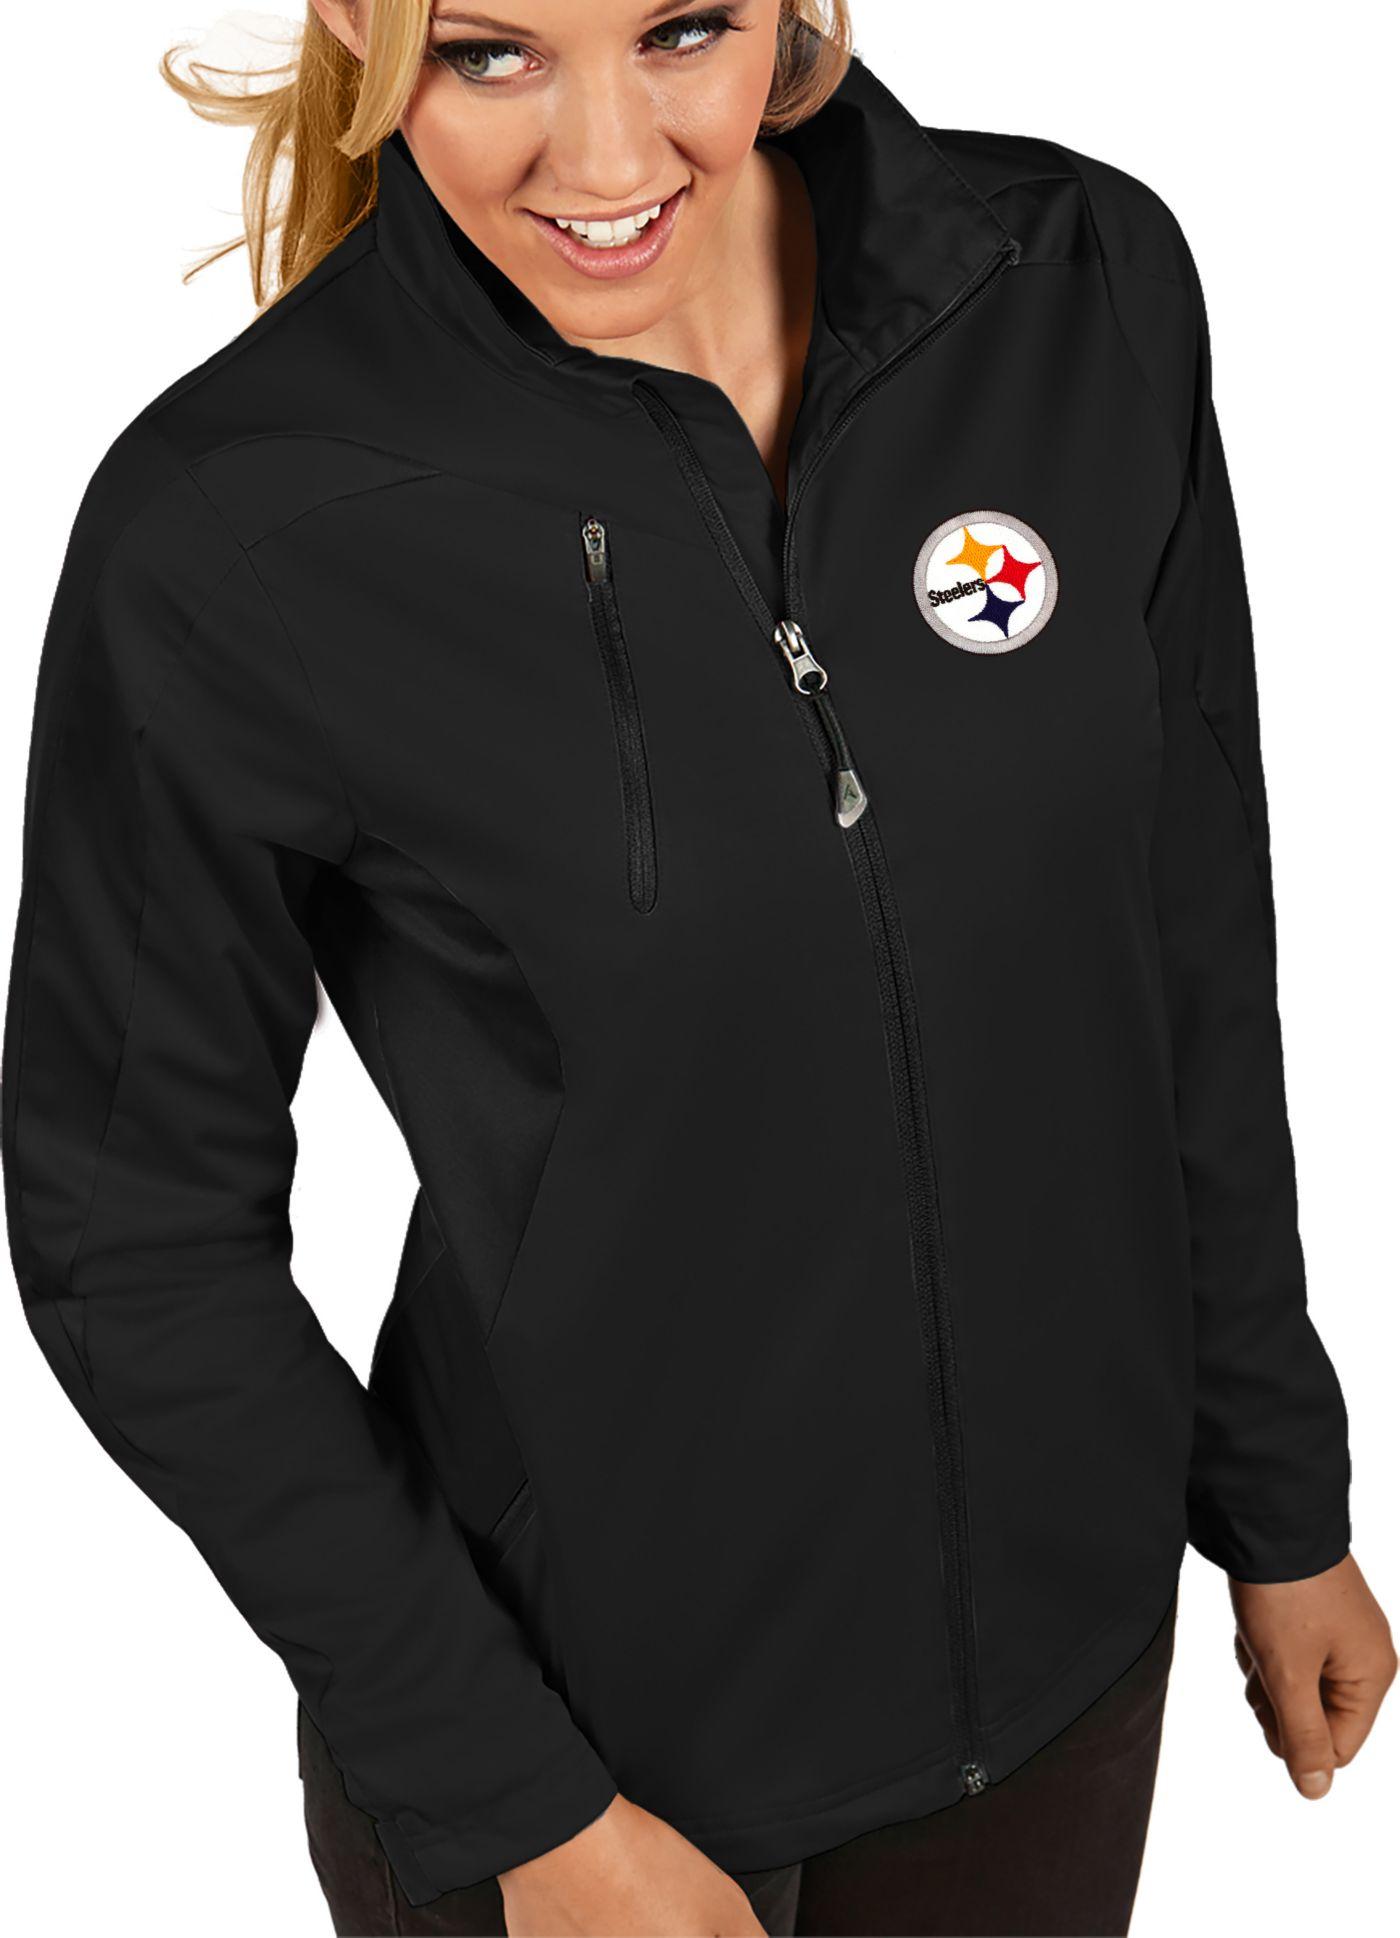 Antigua Women's Pittsburgh Steelers Discover Full-Zip Black Jacket